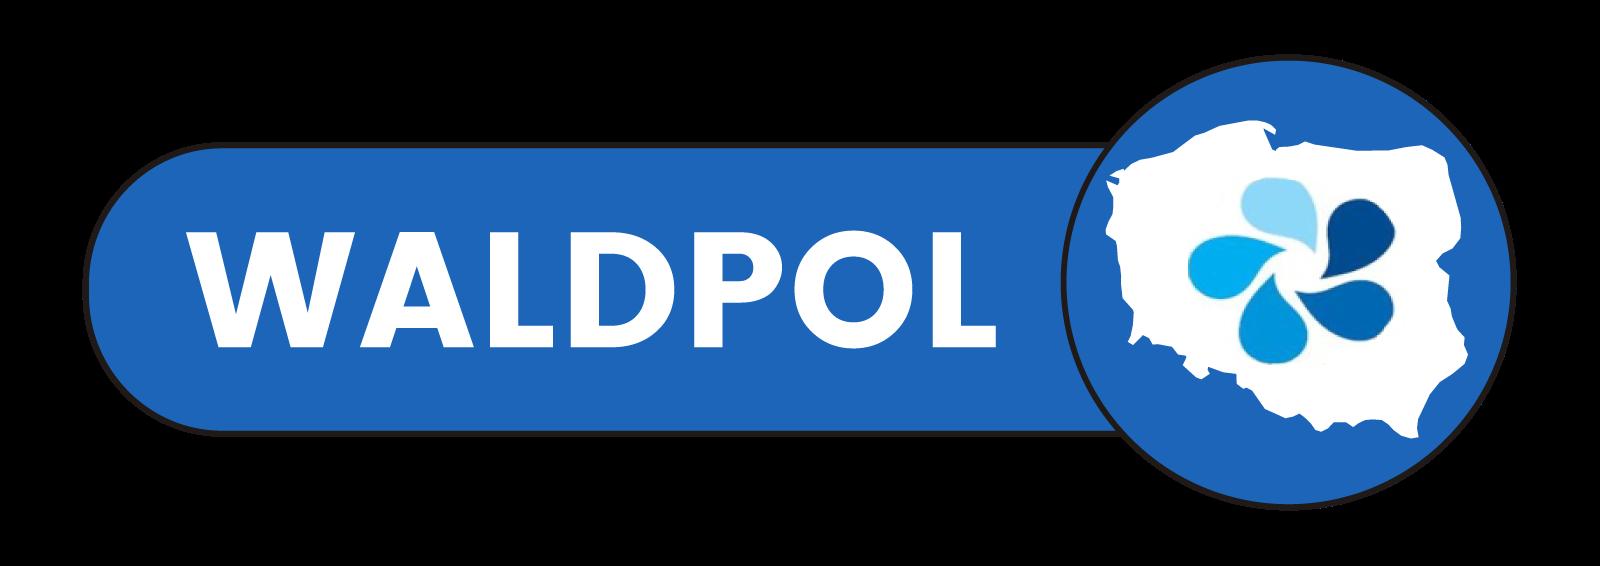 Waldpol